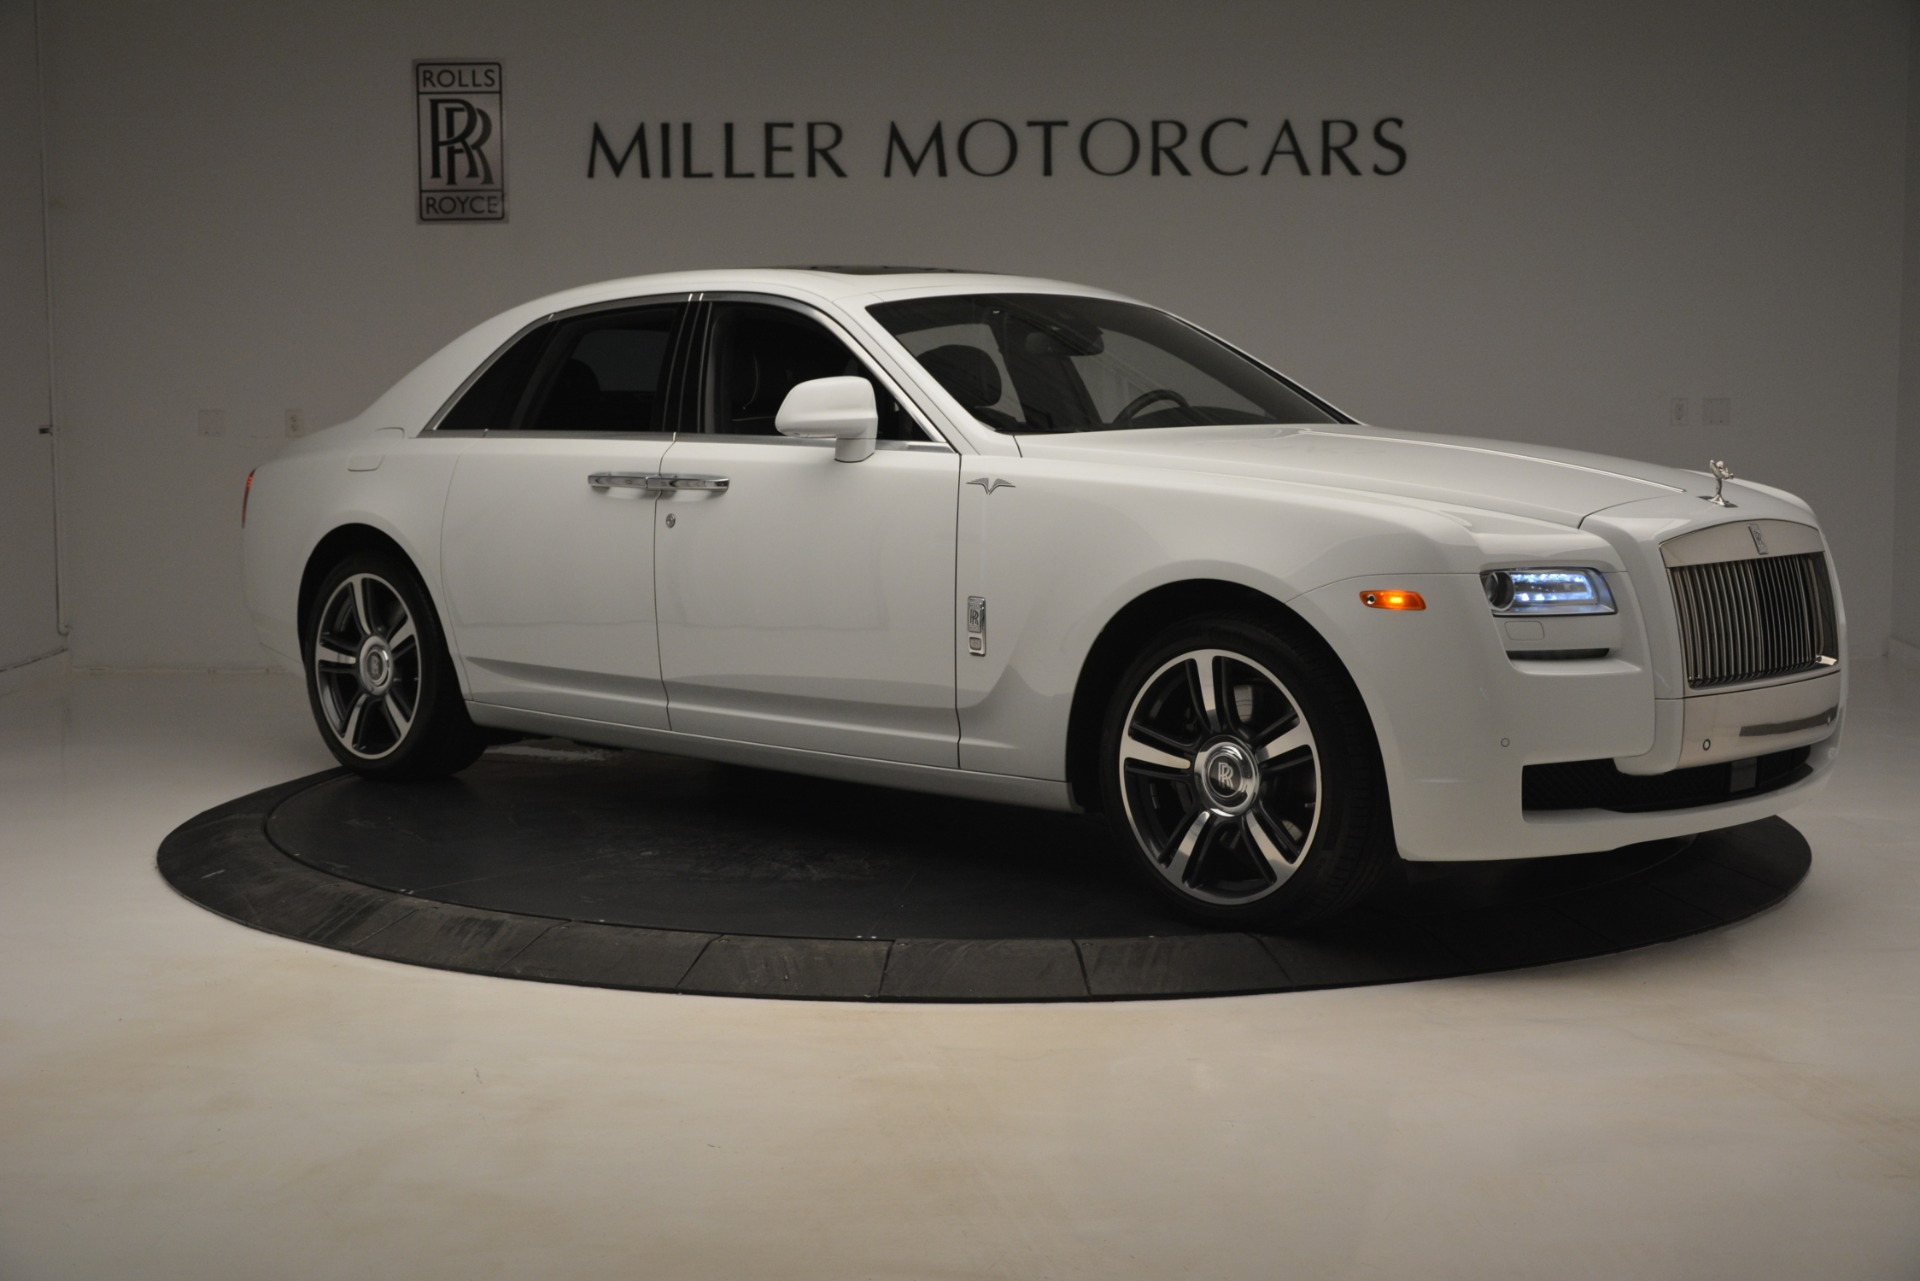 Used 2014 Rolls-Royce Ghost V-Spec For Sale In Westport, CT 2989_p10